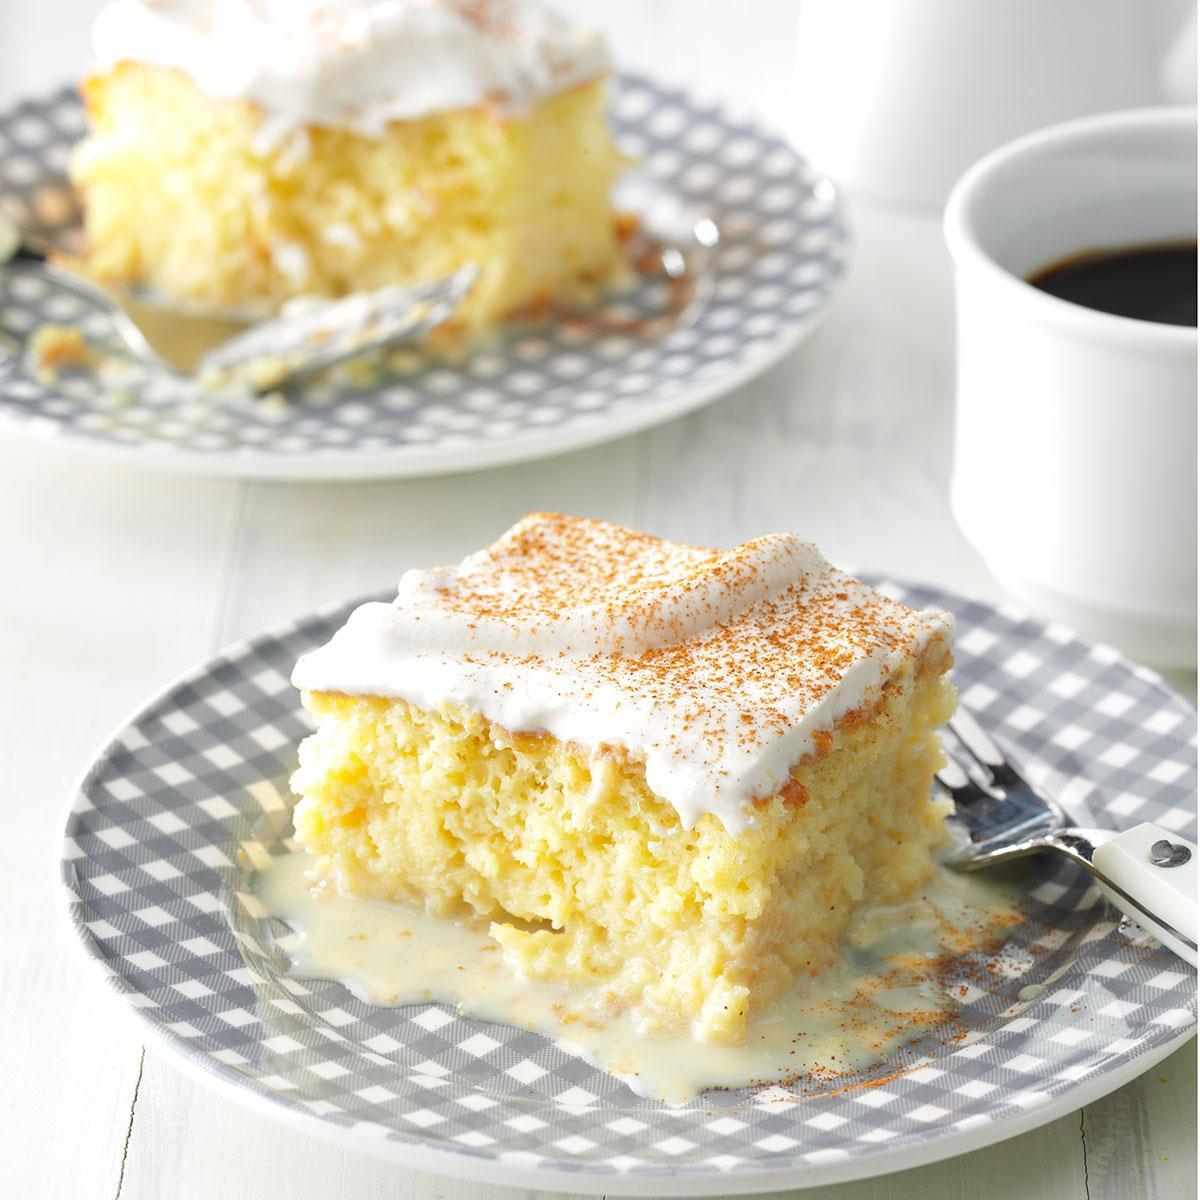 Mexican Dessert Recipe  Top 10 Mexican Dessert Recipes